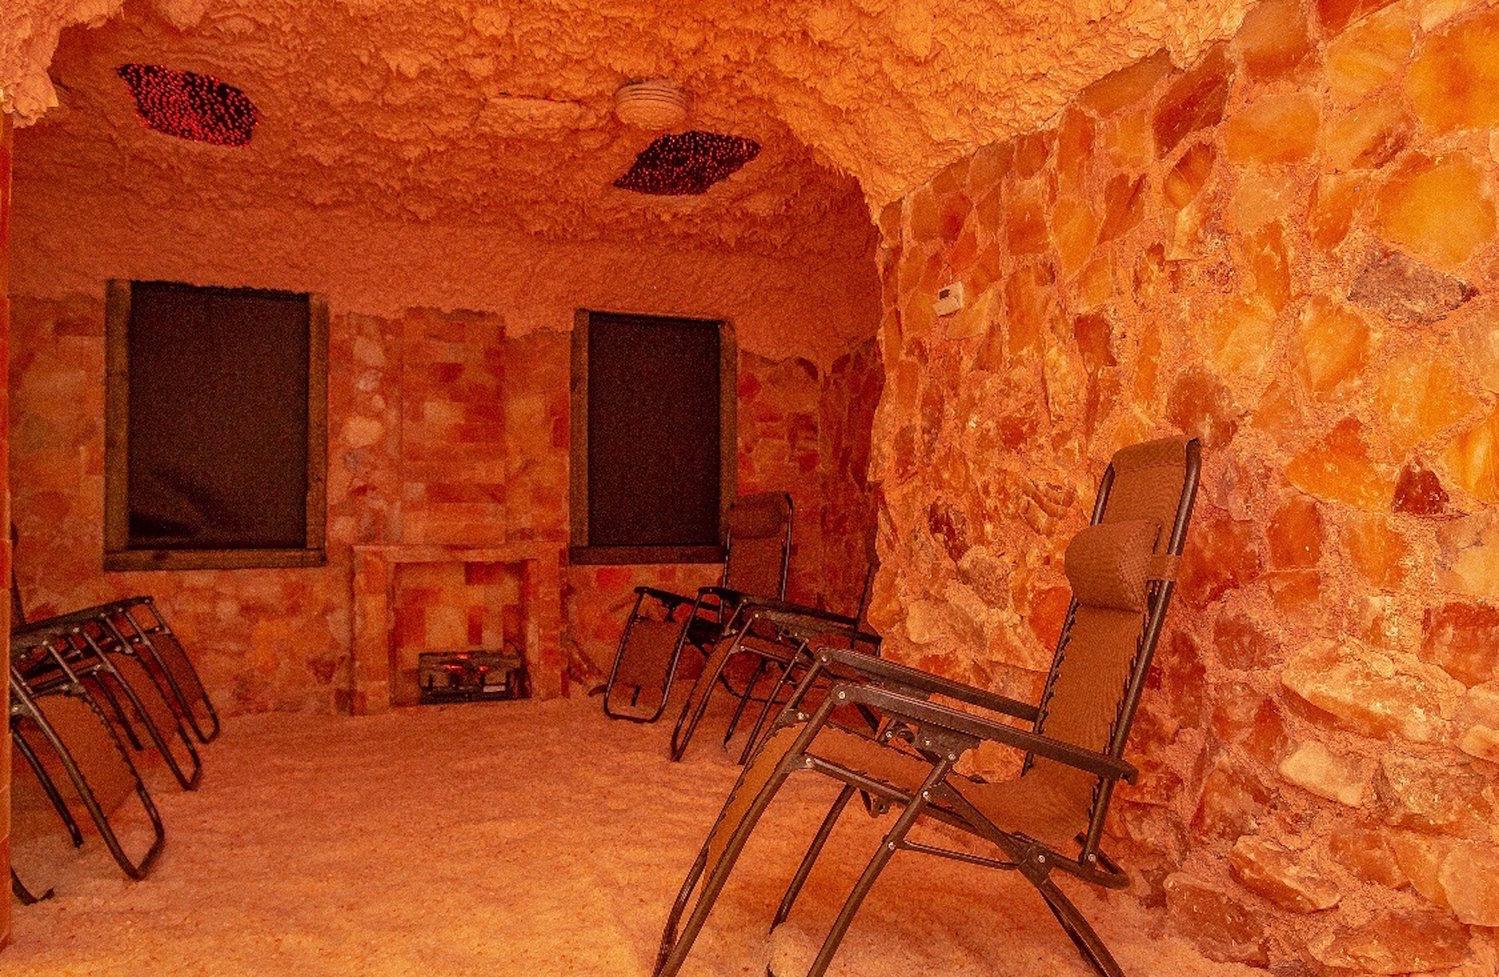 holistic health at new salt cave in glen cove